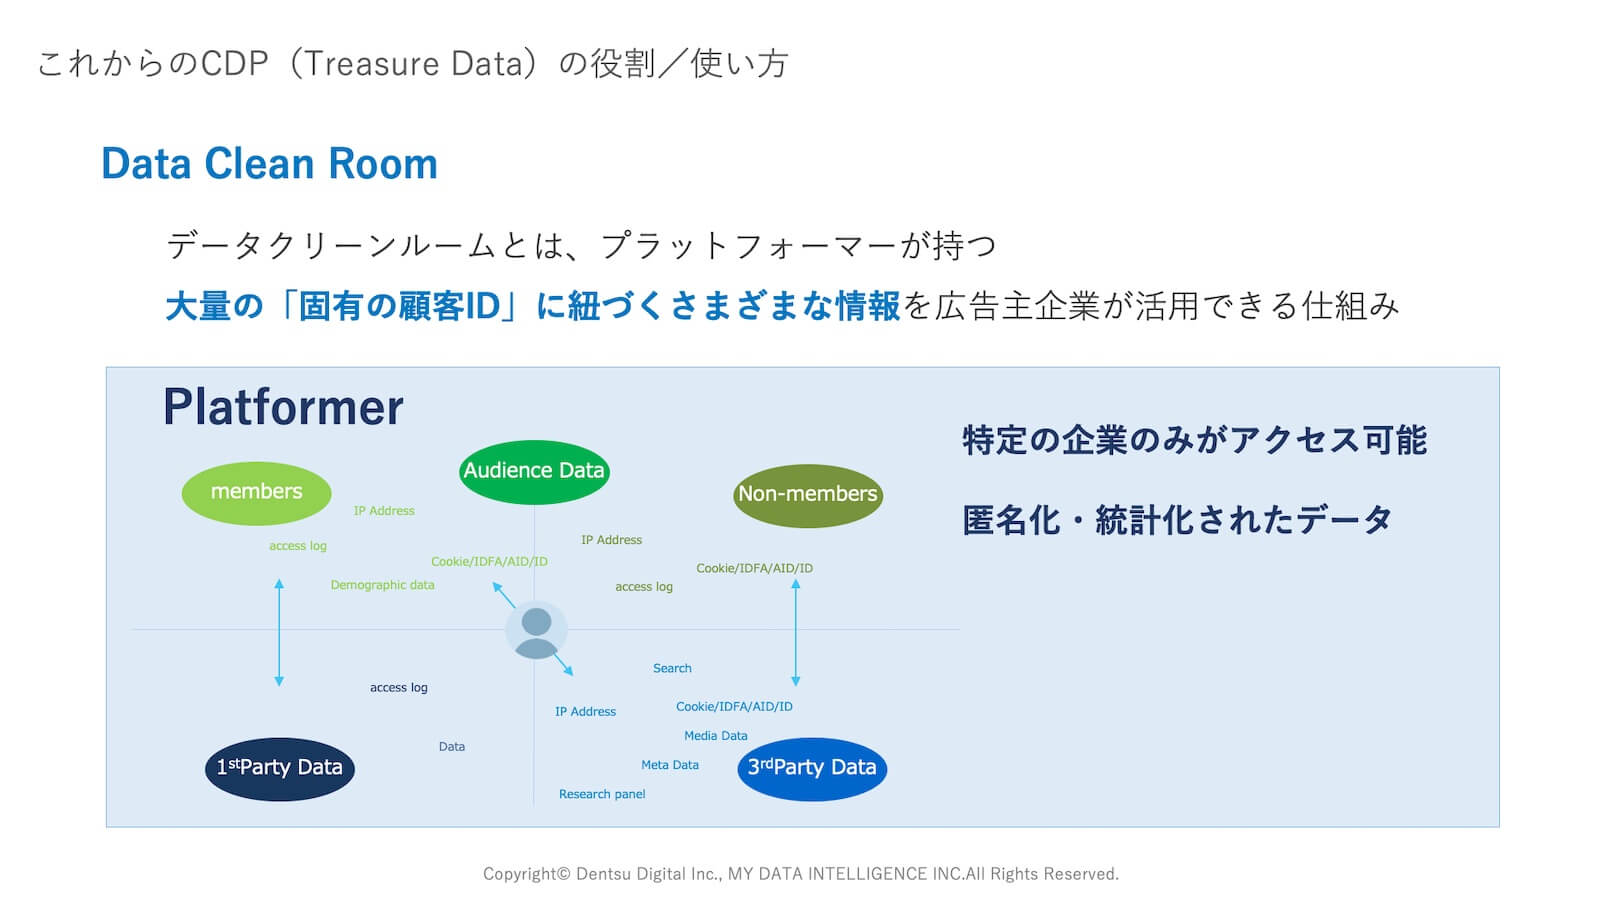 Data Clean Room